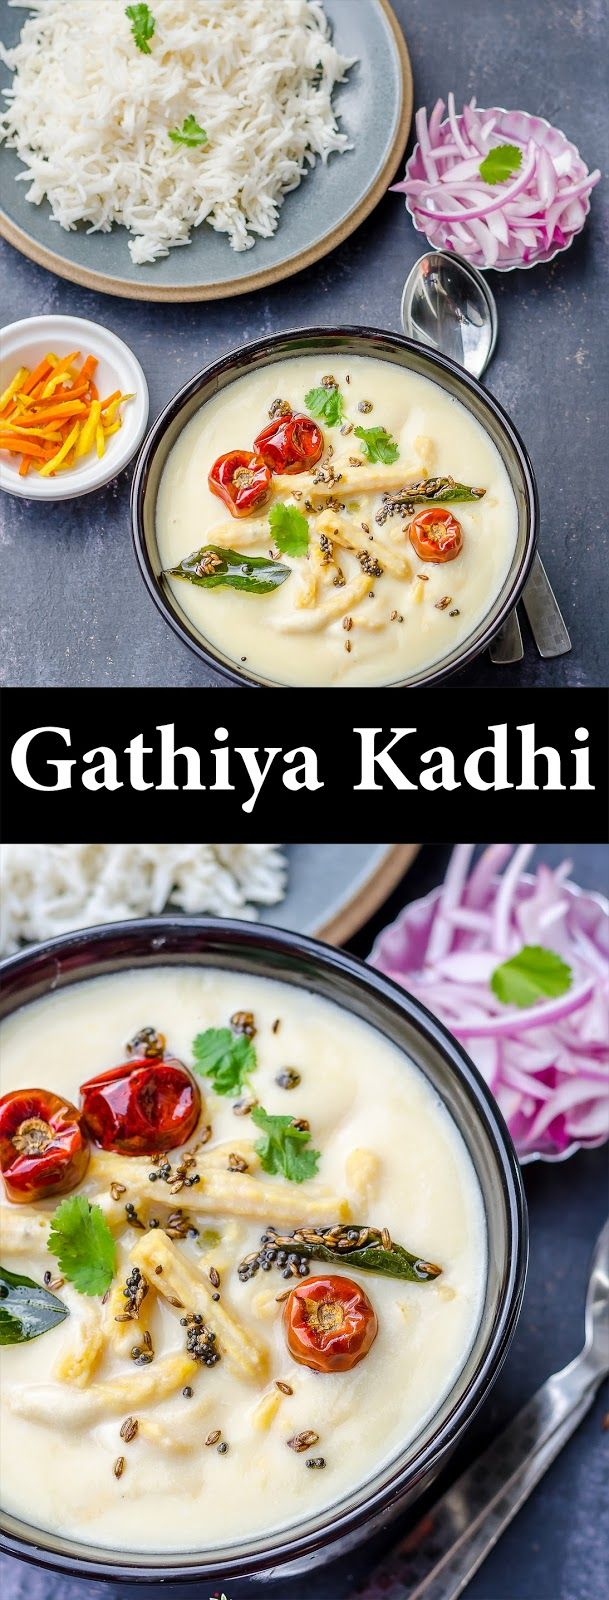 Herbivore Cucina: Gathiya Waali Kadhi...A tempting and comforting bowl of Gathiya Waali Kadhi with added flour dumplings, this is perfect with steamed rice! #ComfortFood #DalsAndSoups #DumplingSoup #GathiyaWaaliKadhi #GujaratiKadhi #GujaratiRecipes #LongLostRecipes #PunjabiKadhiPakoda #SpicedYogurtRecipes #TraditionalIndianRecipes